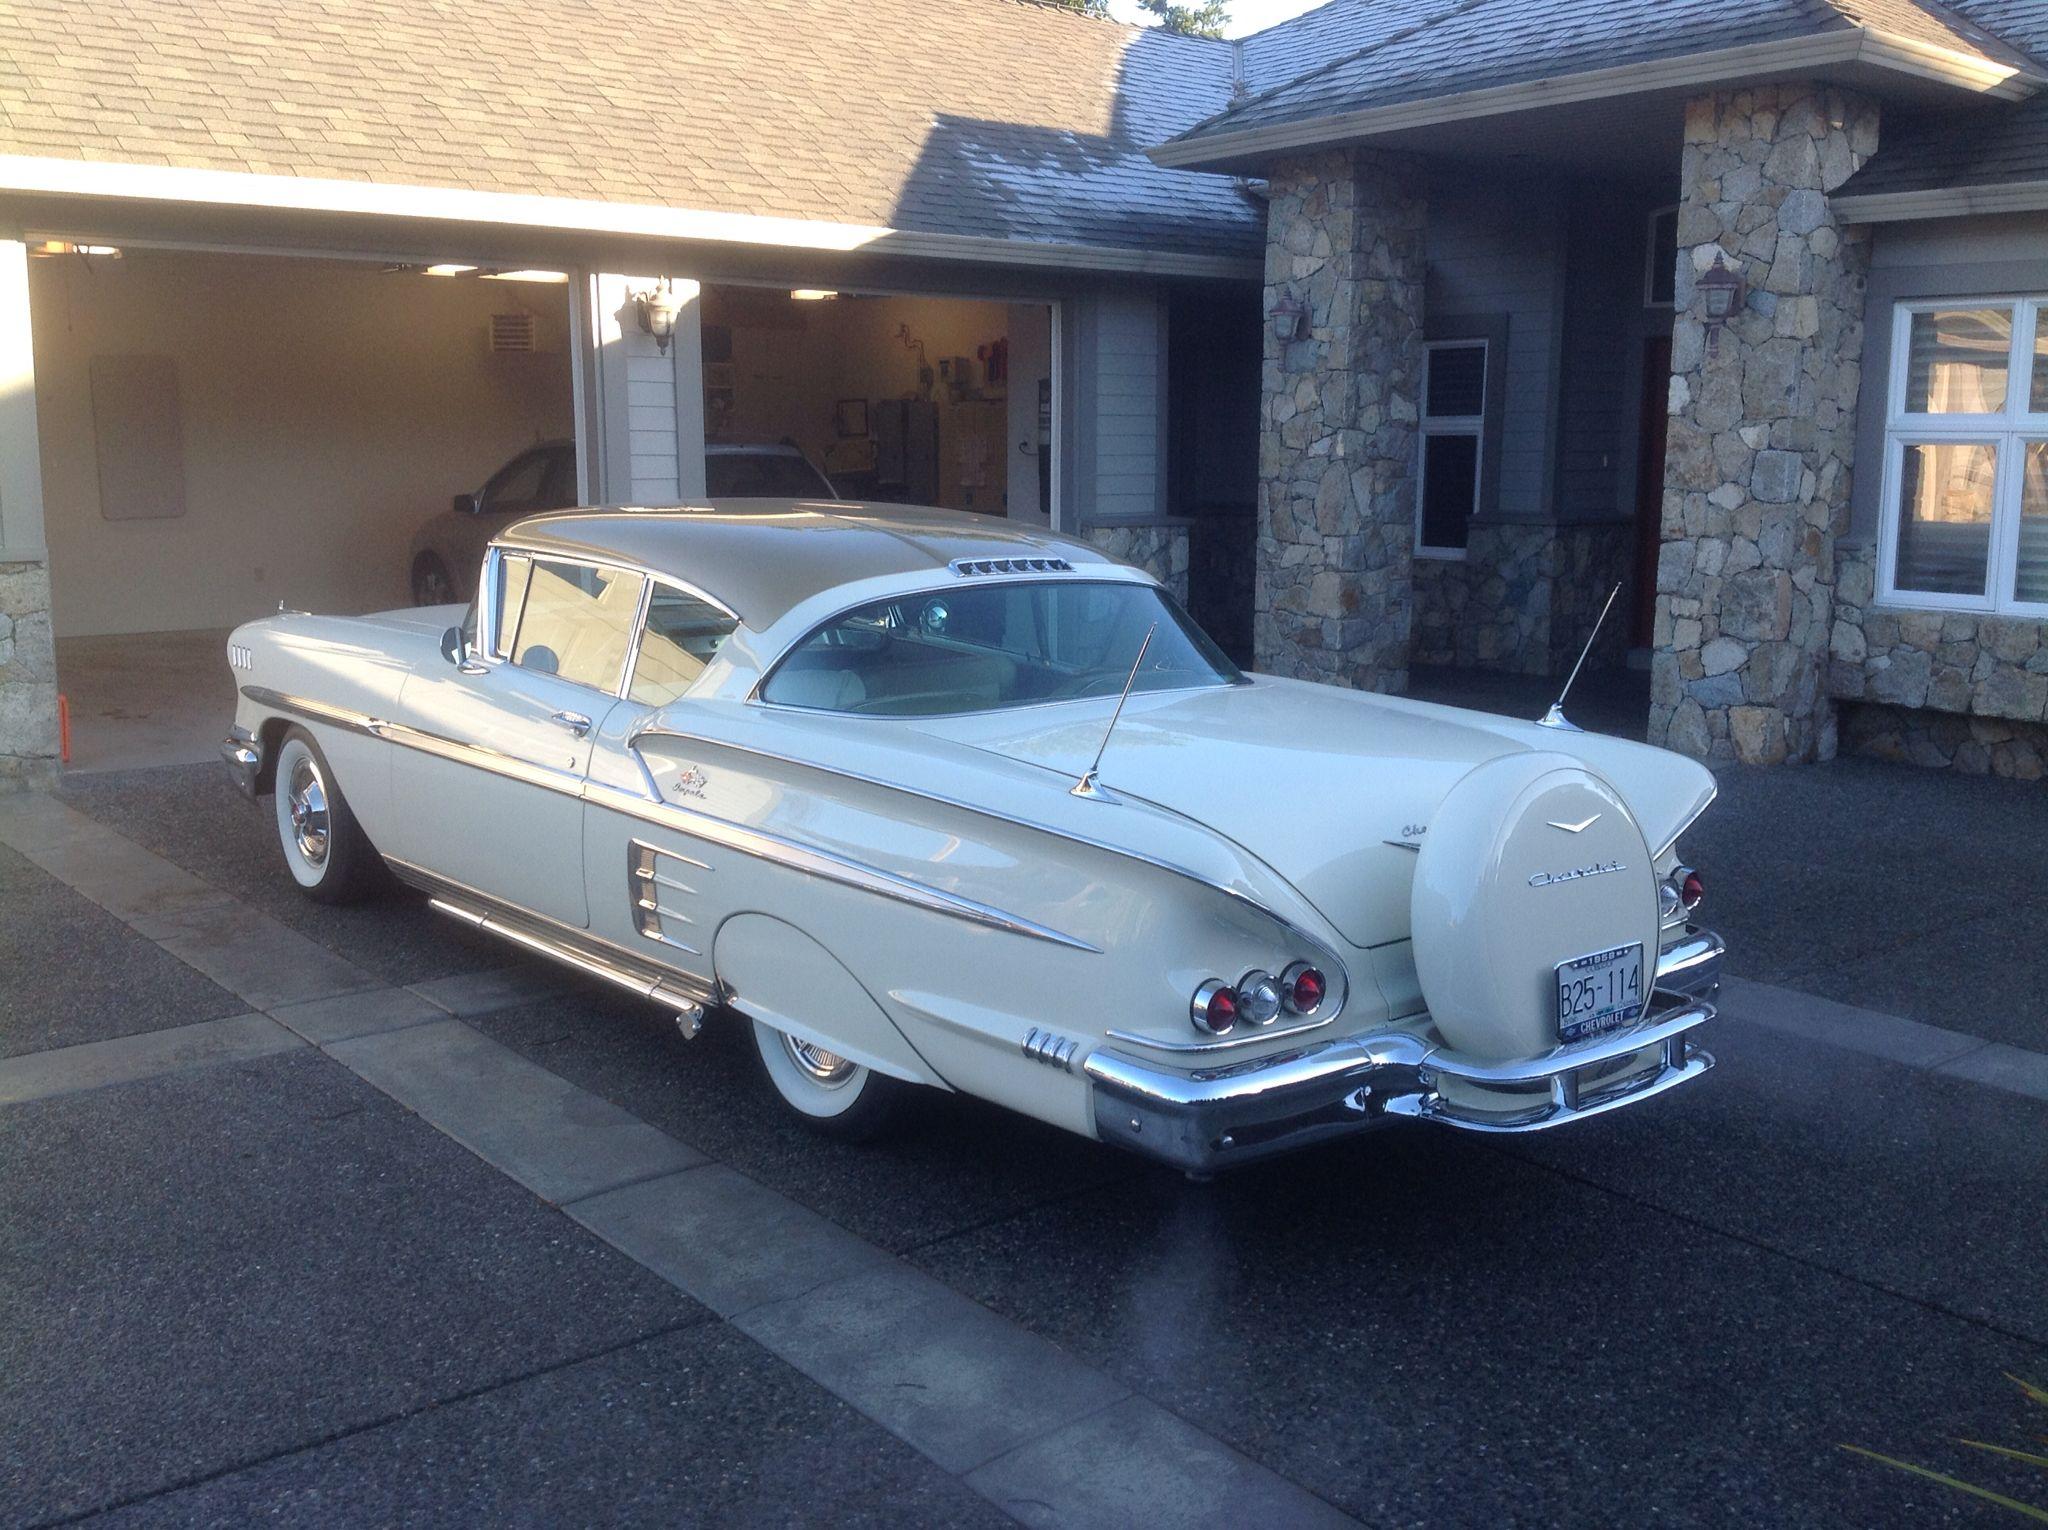 1958 Impala 1 Of 120 This Color 4 Wheel Disc Brakes 350 Ram Jet